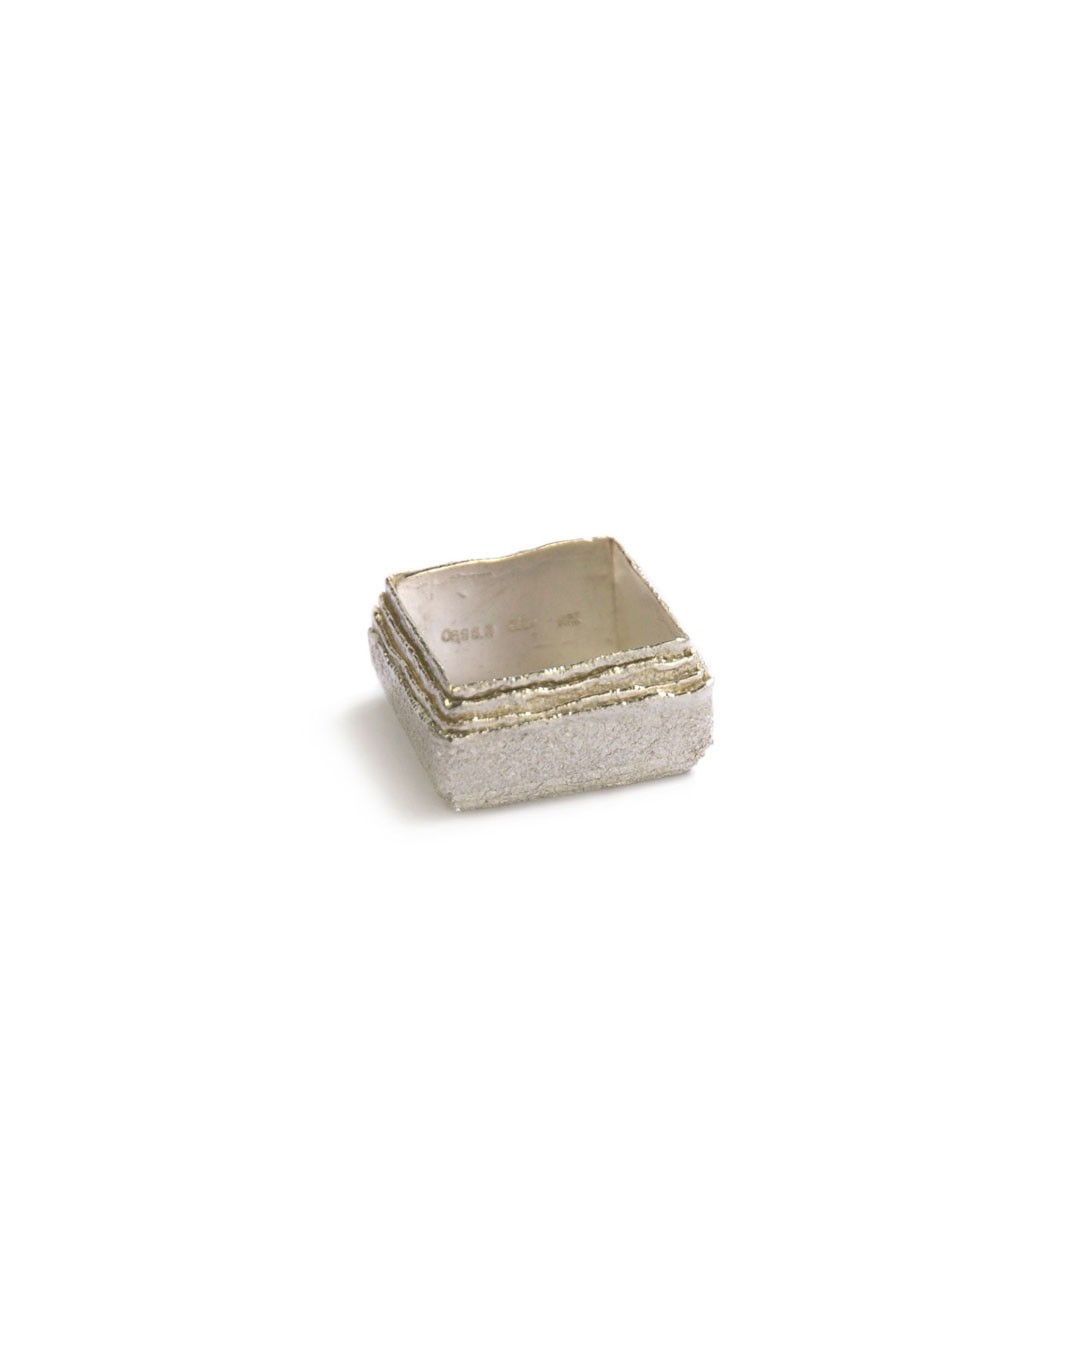 Okinari Kurokawa, untitled, 2006, ring; 970 silver, 22 x 22 x 12 mm